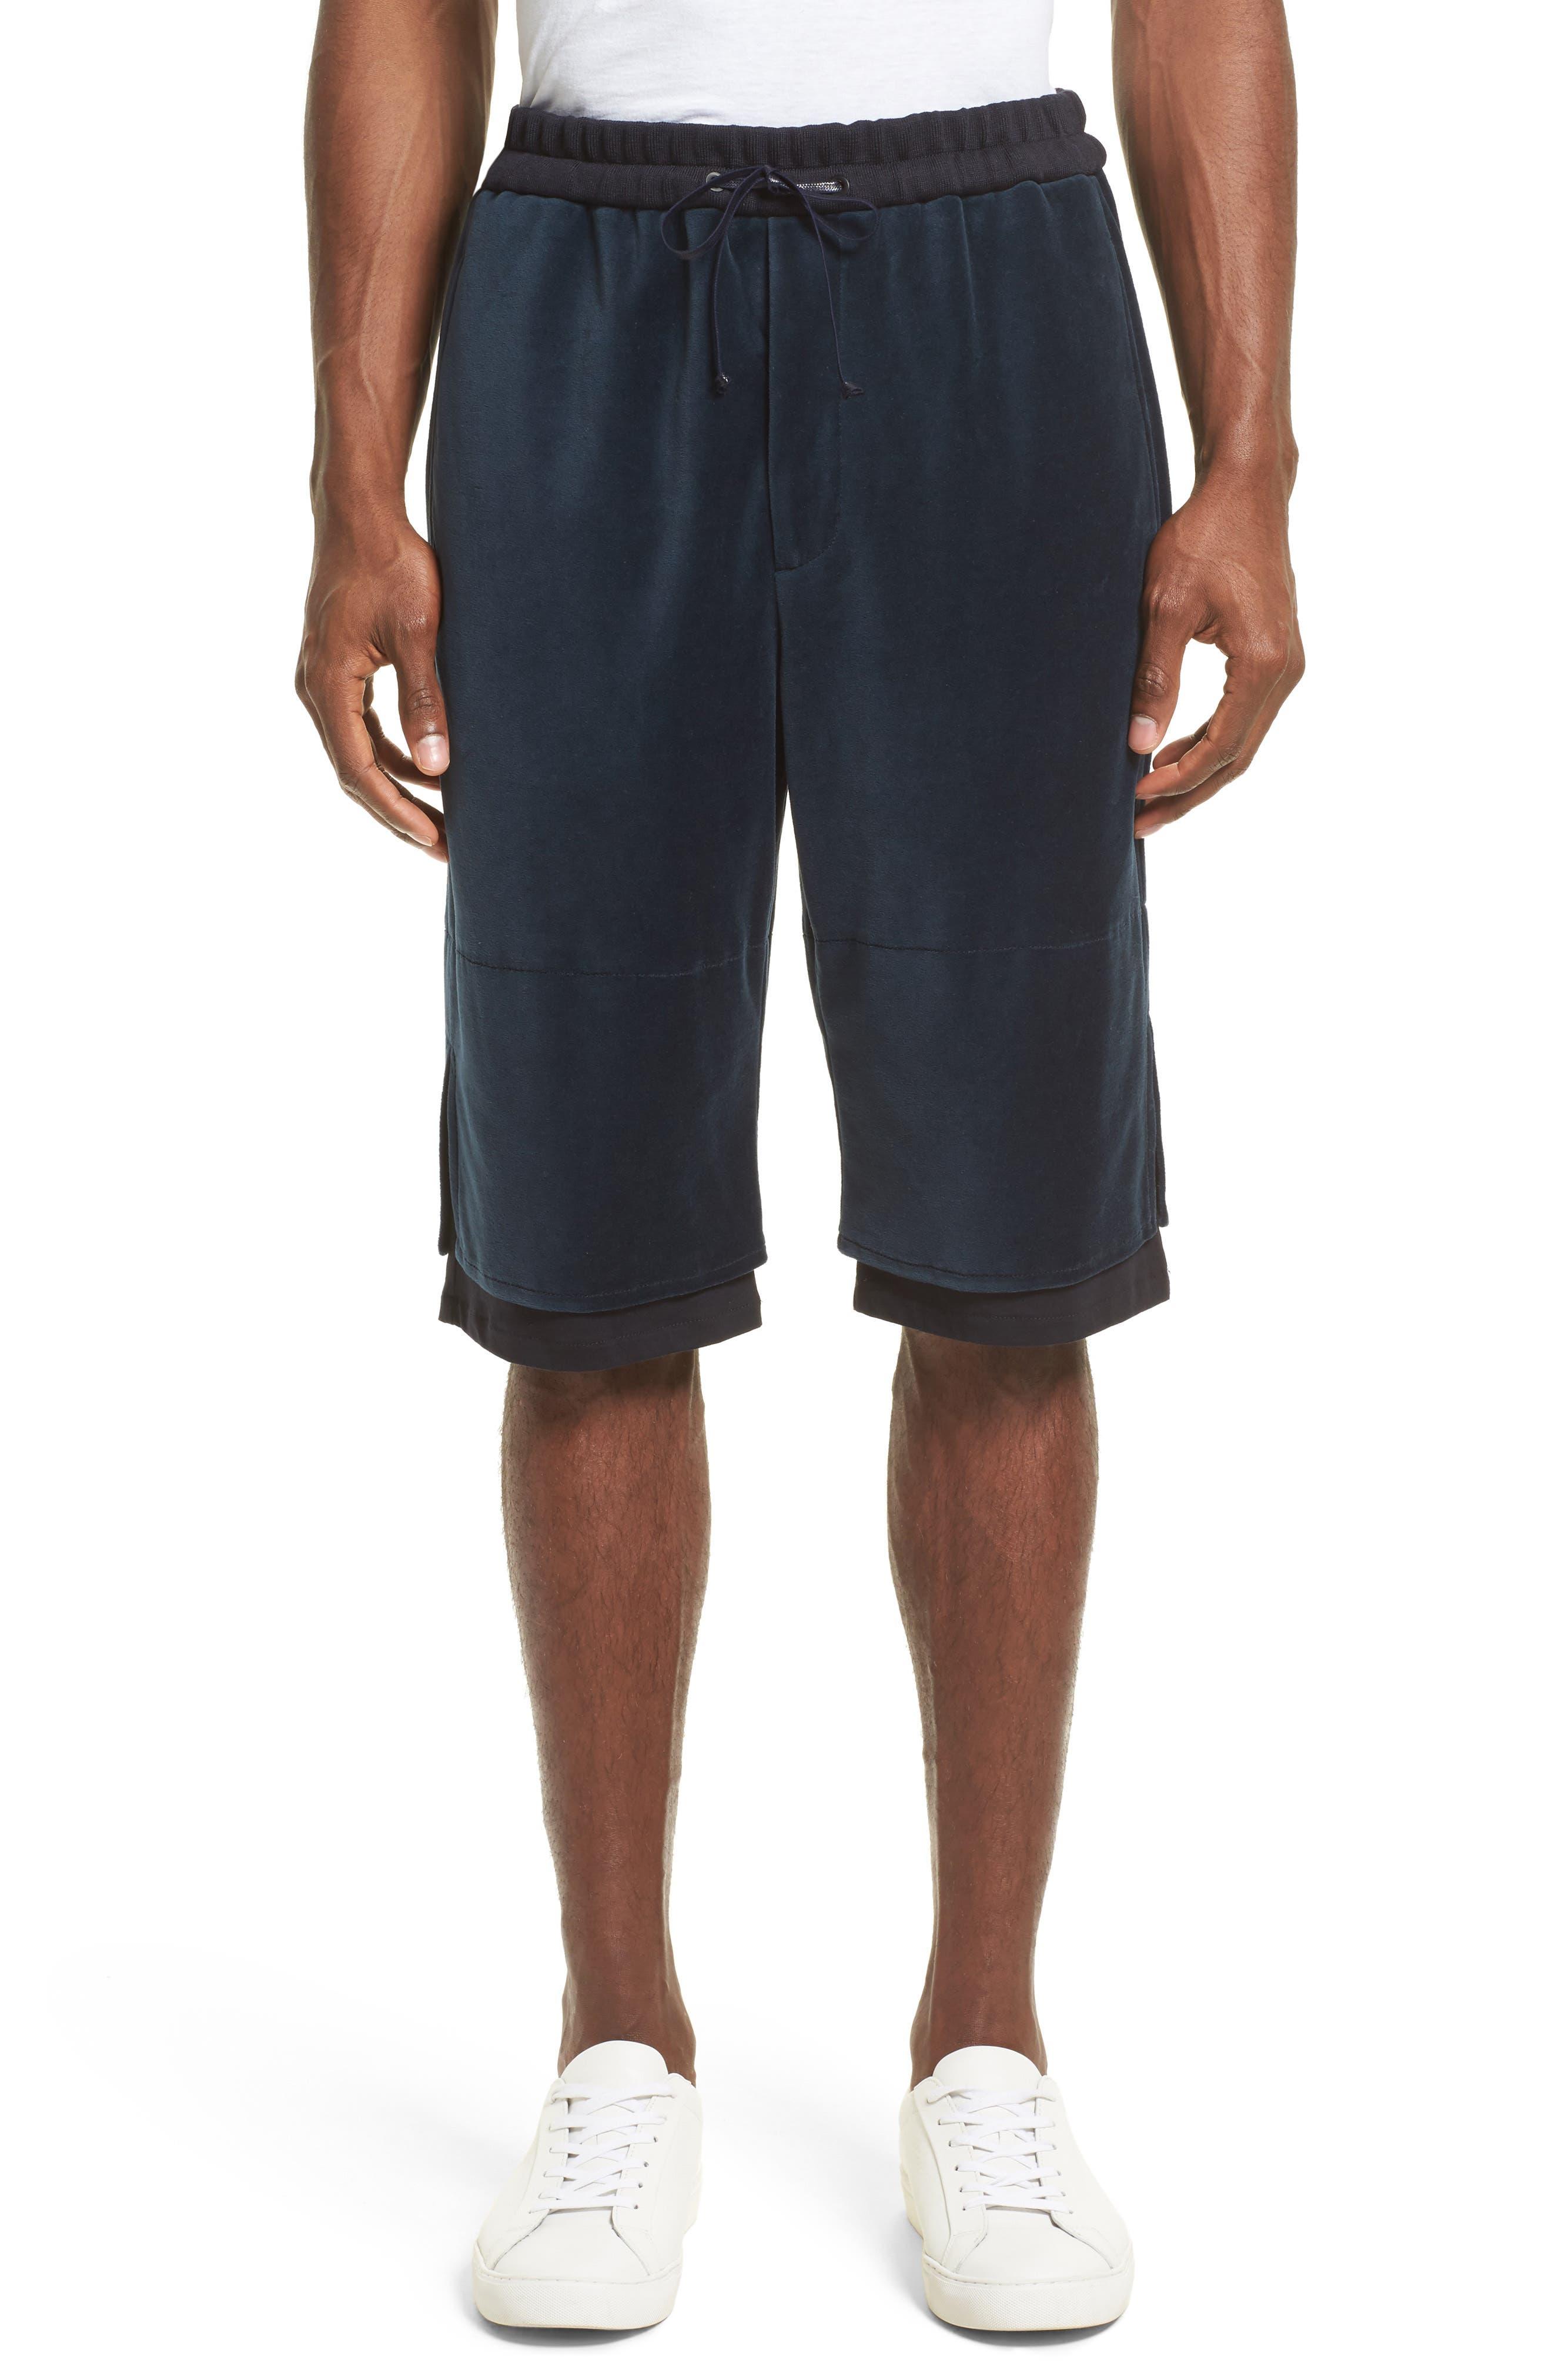 Main Image - 3.1 Phillip Lim Double Layer Shorts